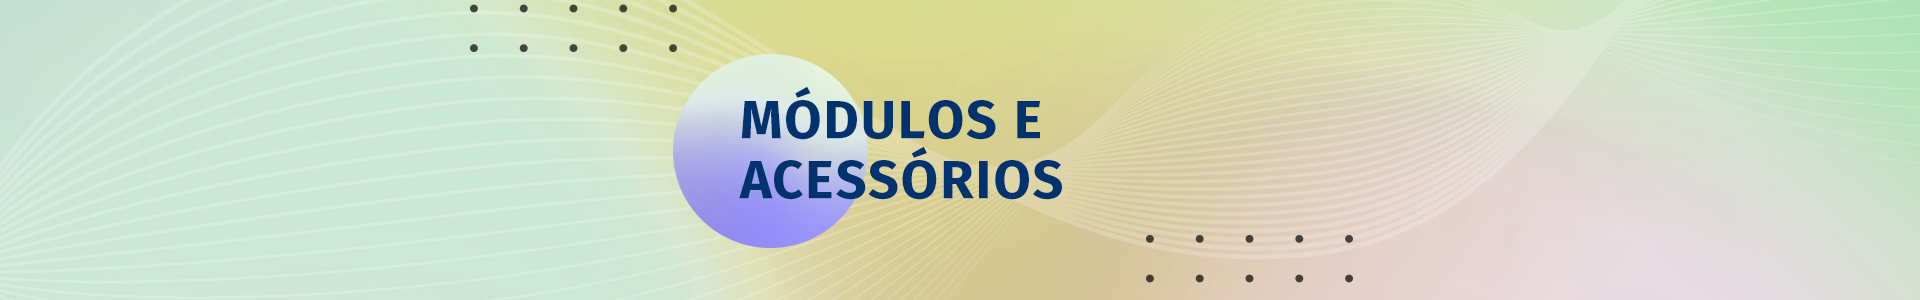 Banner categoria - Modulos e acessorios